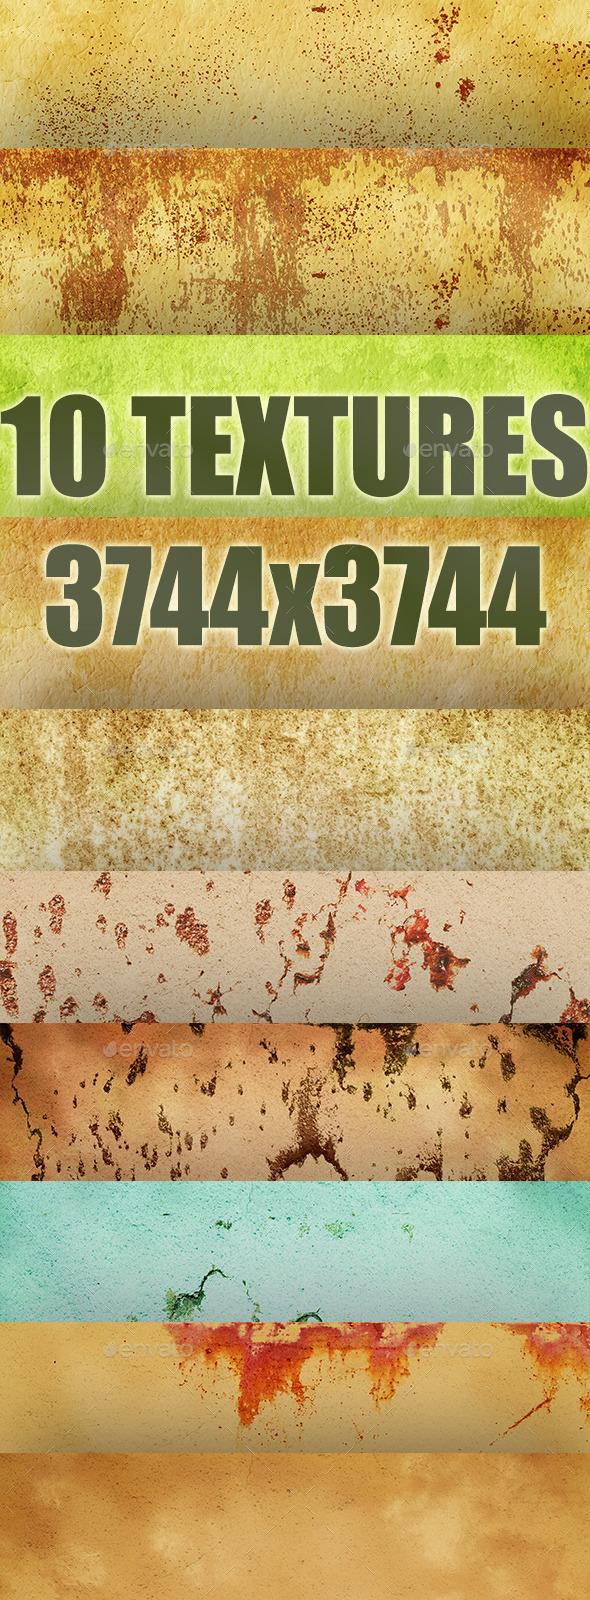 Grunge Textures Pack 6 - Industrial / Grunge Textures